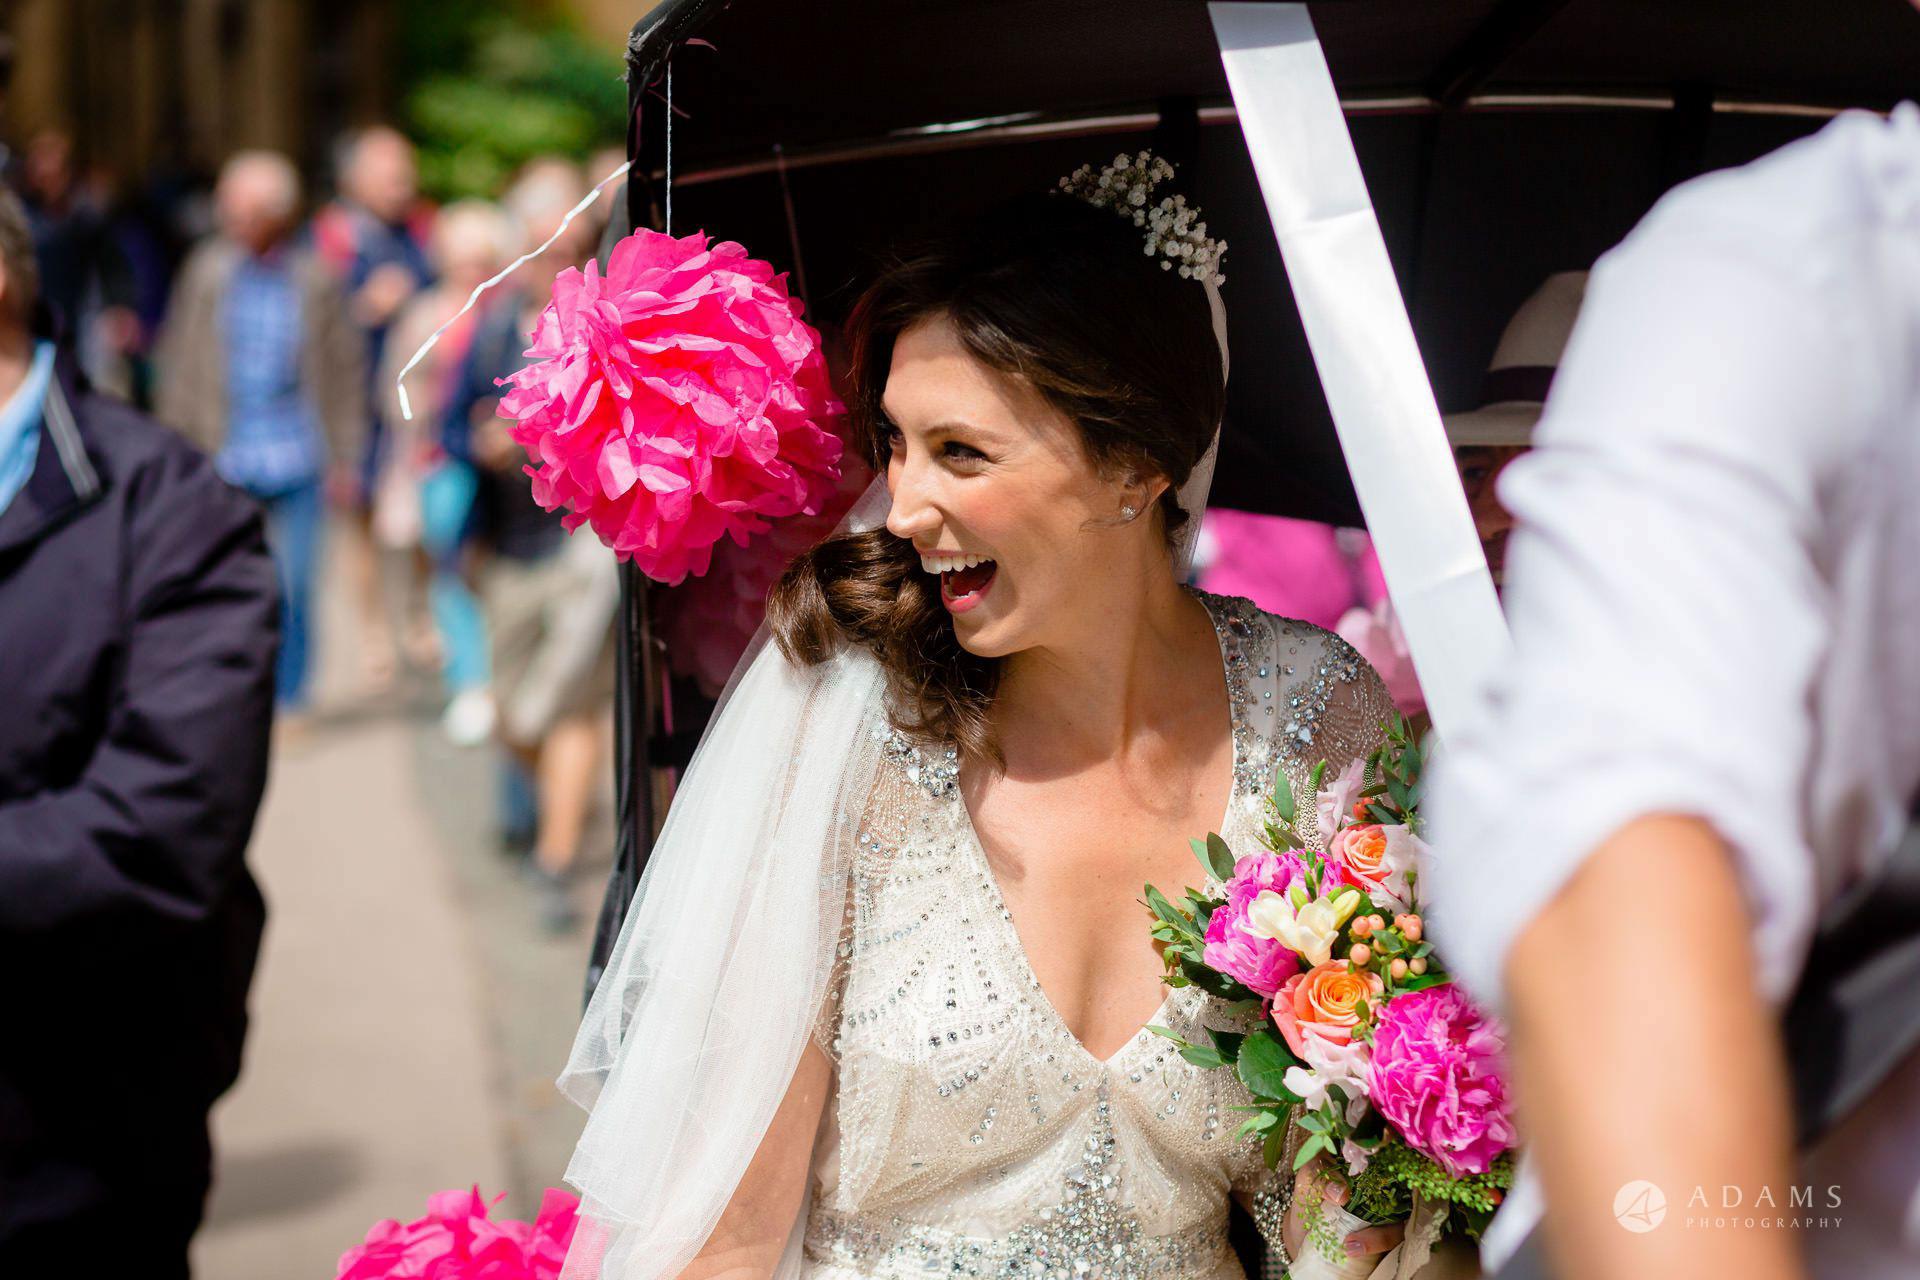 Clare College wedding bride arrives